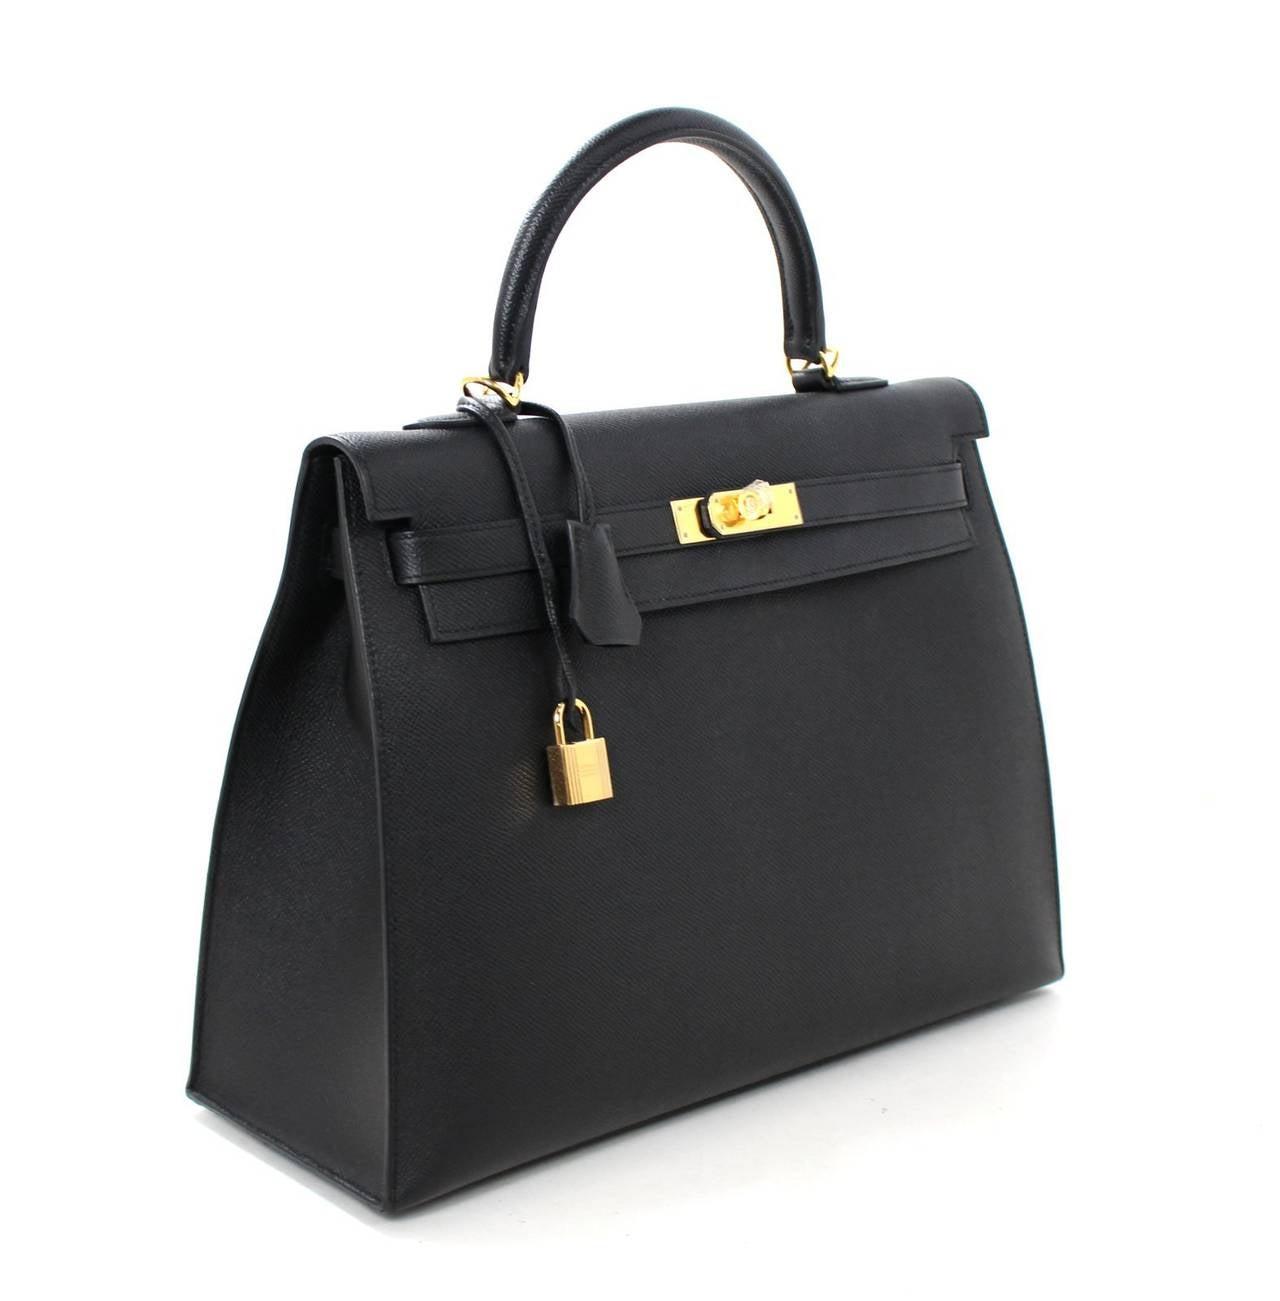 Hermes Black Kelly Sellier- Epsom Leather GHW  in 35 cm size 2